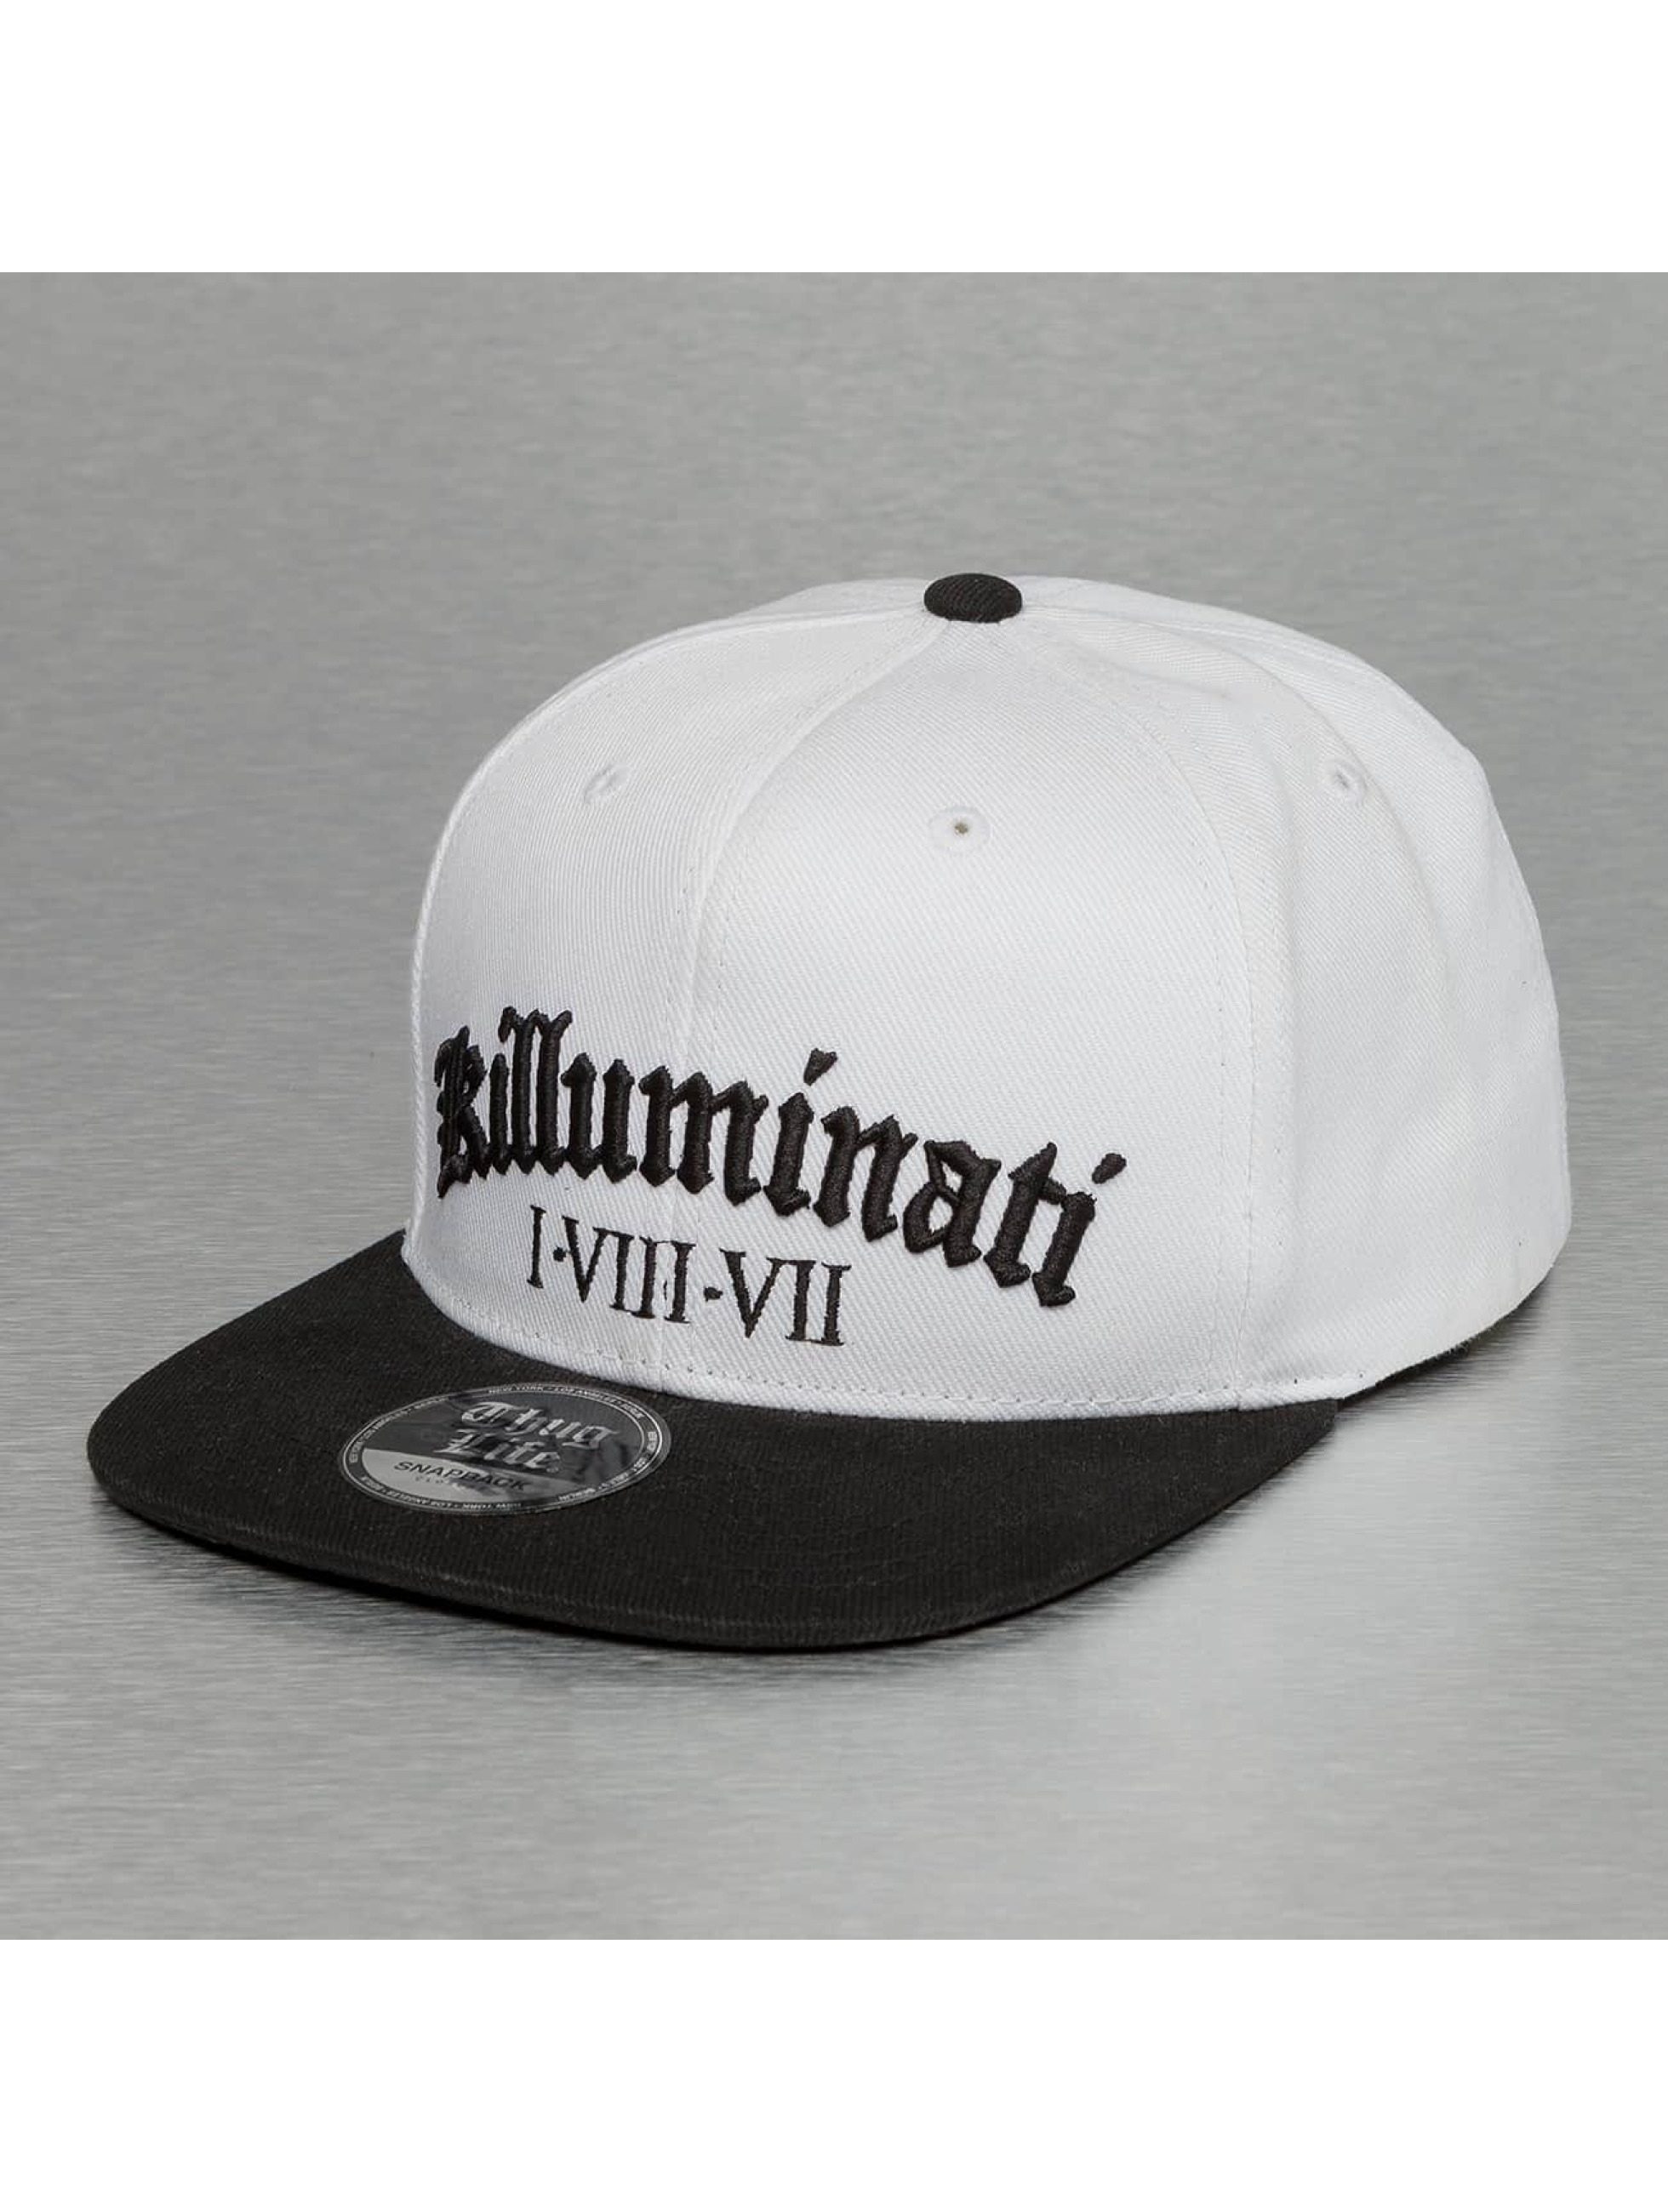 Thug Life Casquette Snapback & Strapback Killuminati blanc